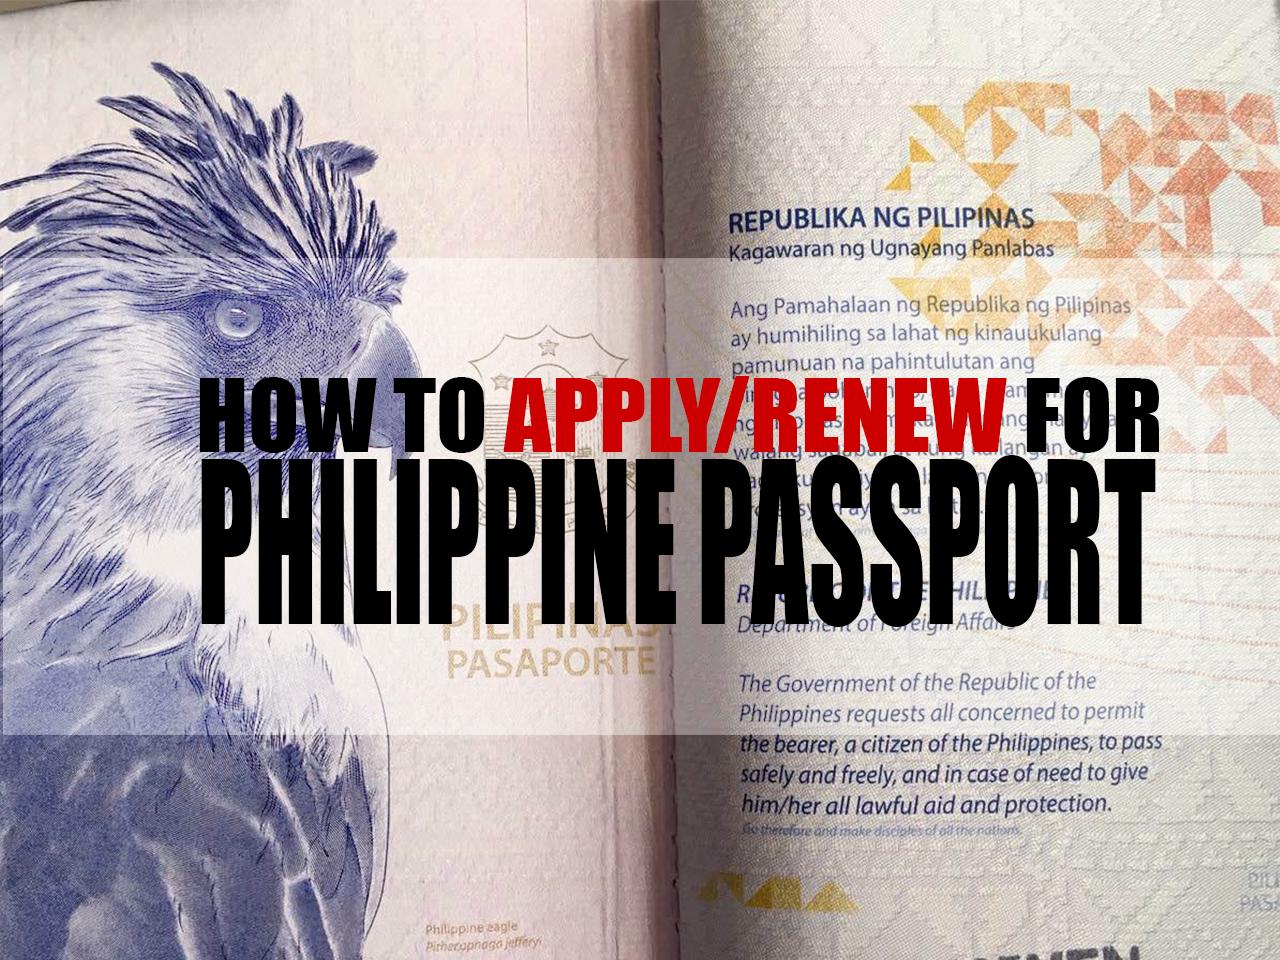 How To Applyrenew For A Philippine Passport Dfa Passport